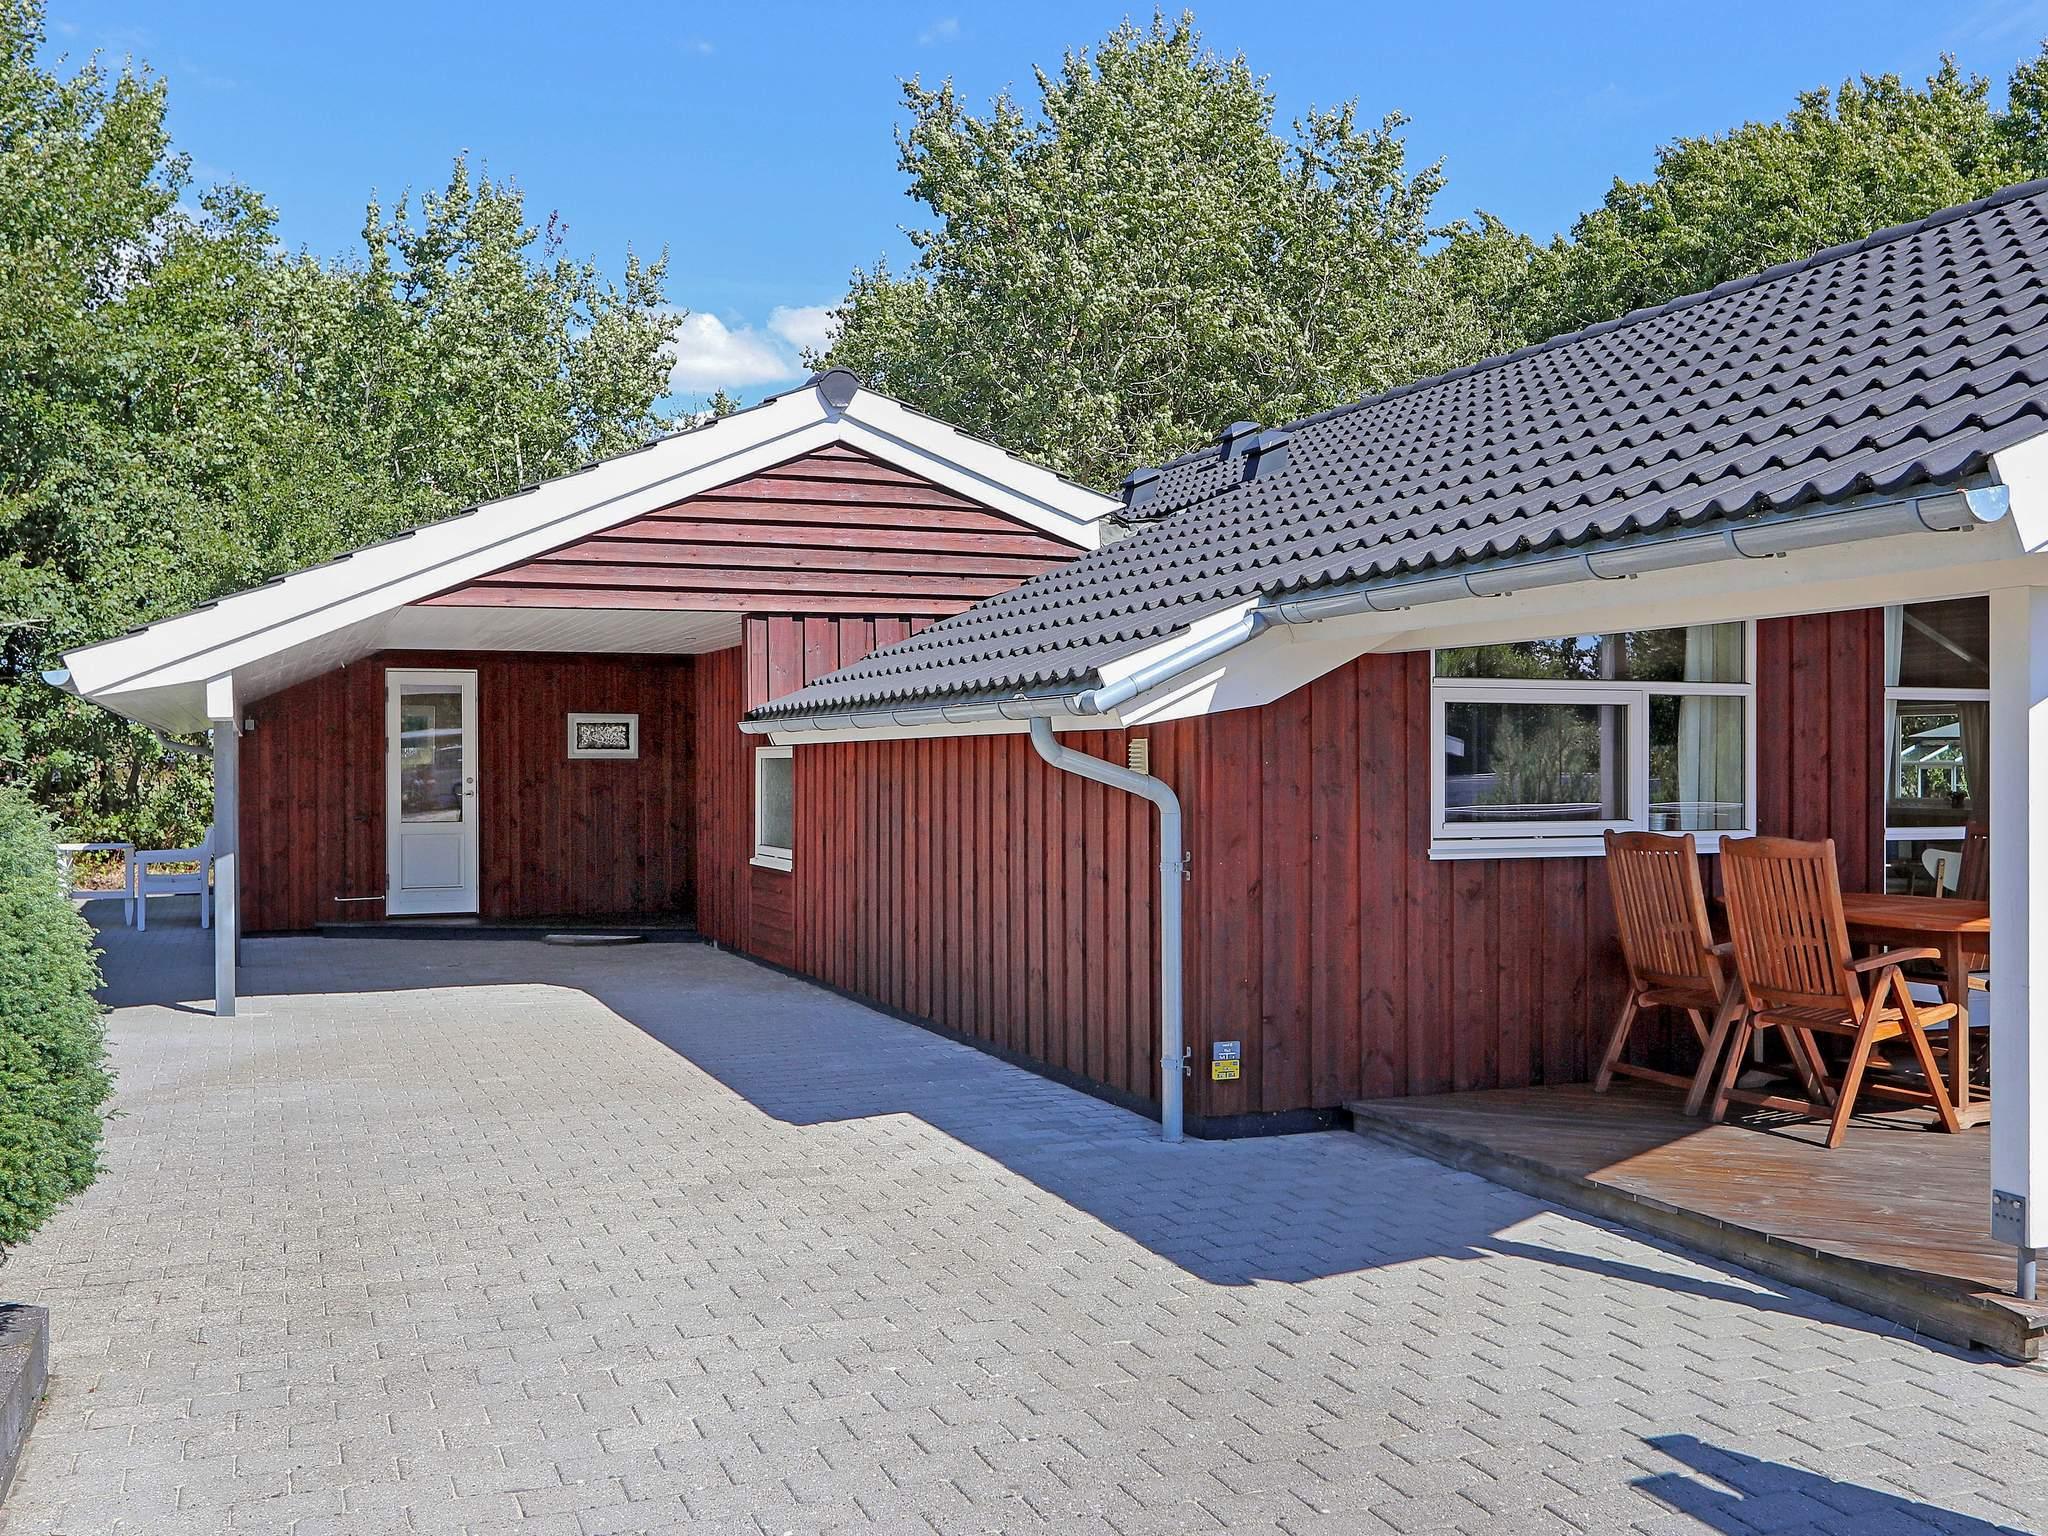 Maison de vacances Bredfjed (2523741), Bredfjed, , Lolland, Danemark, image 14